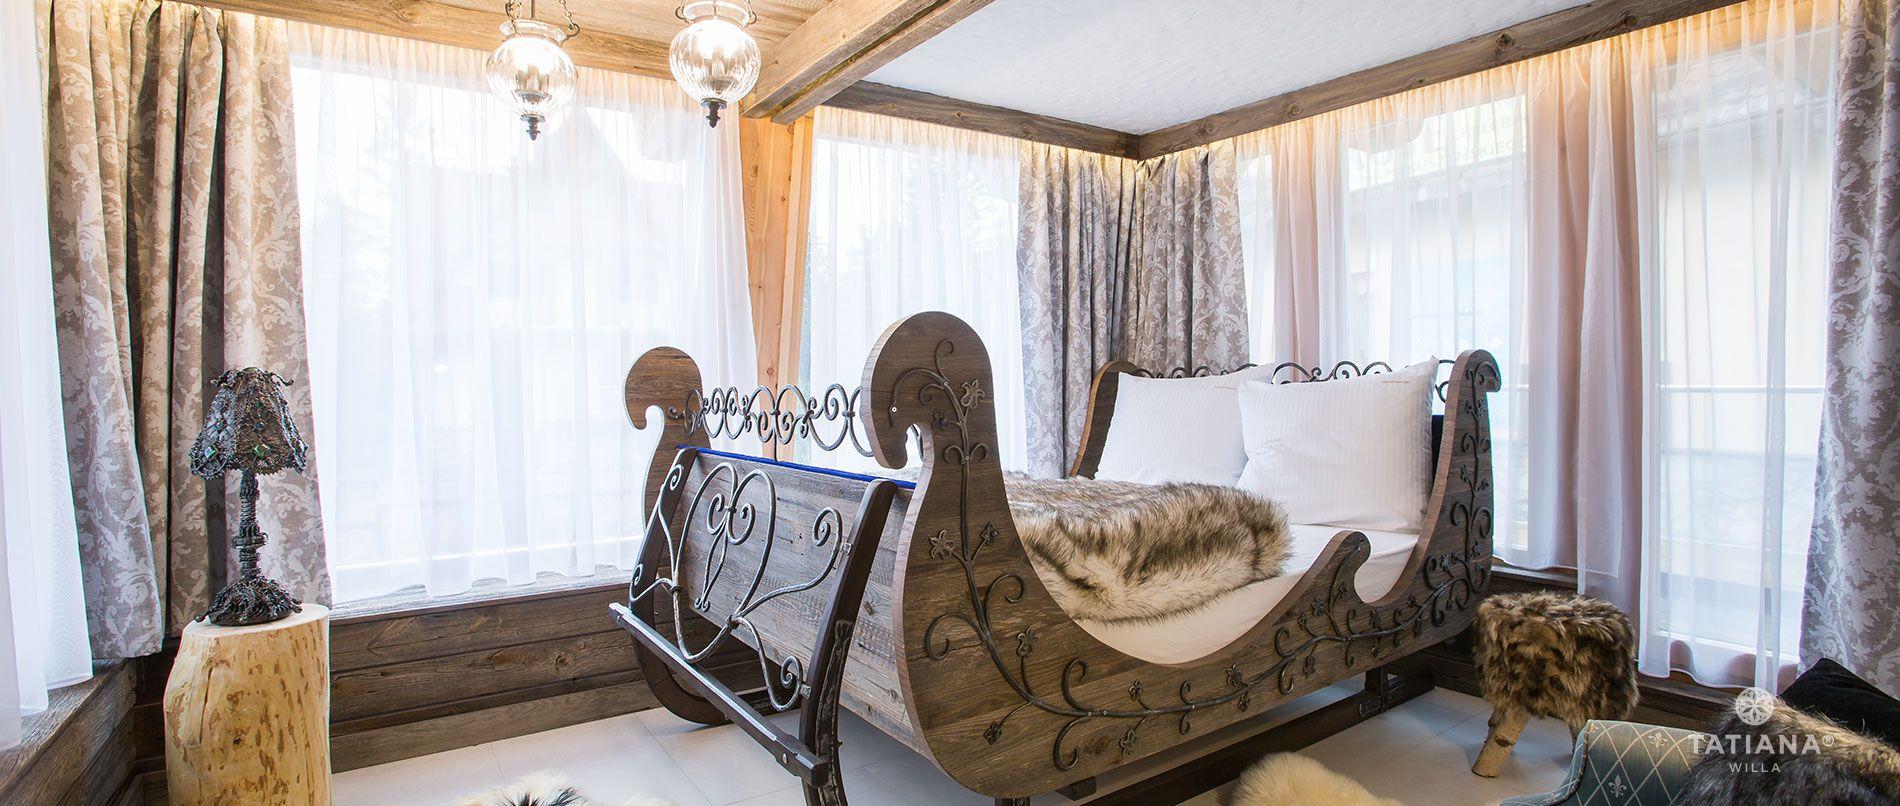 Apartament Syberyjski- druga sypialnia